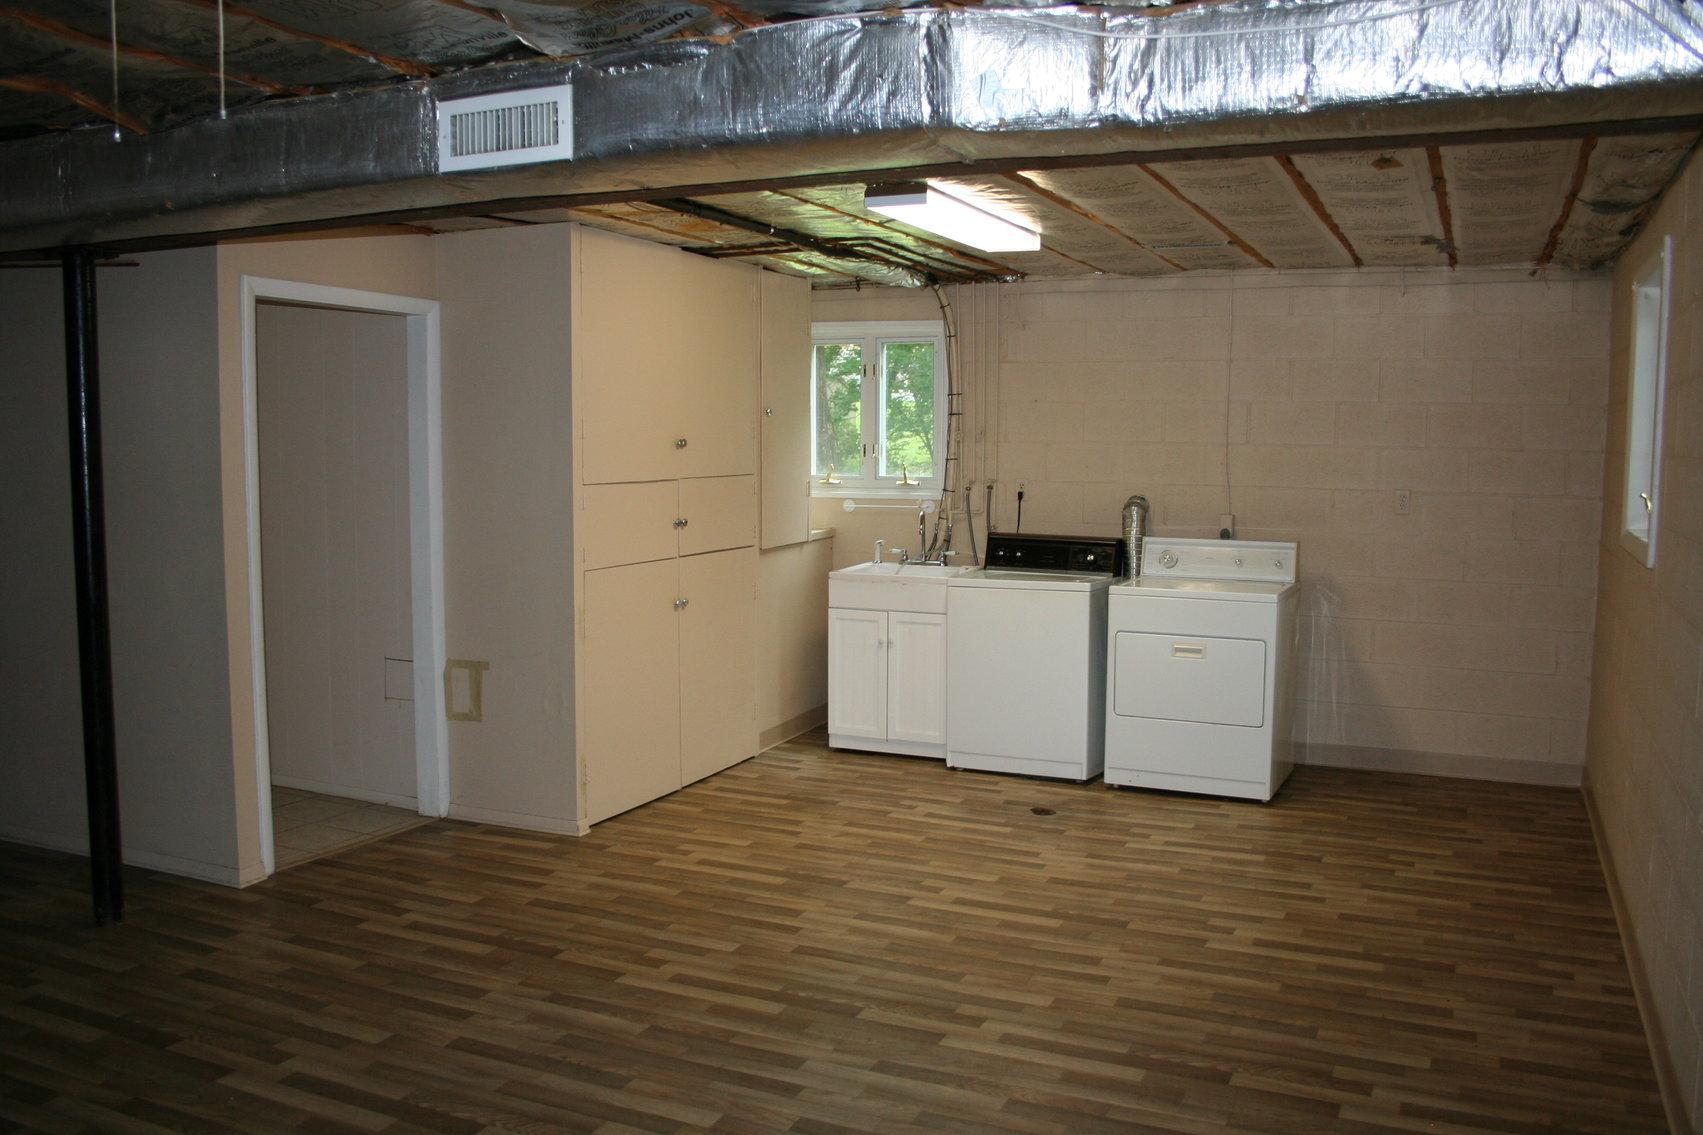 Image for 114 Pacos St Lynchburg, VA 24502